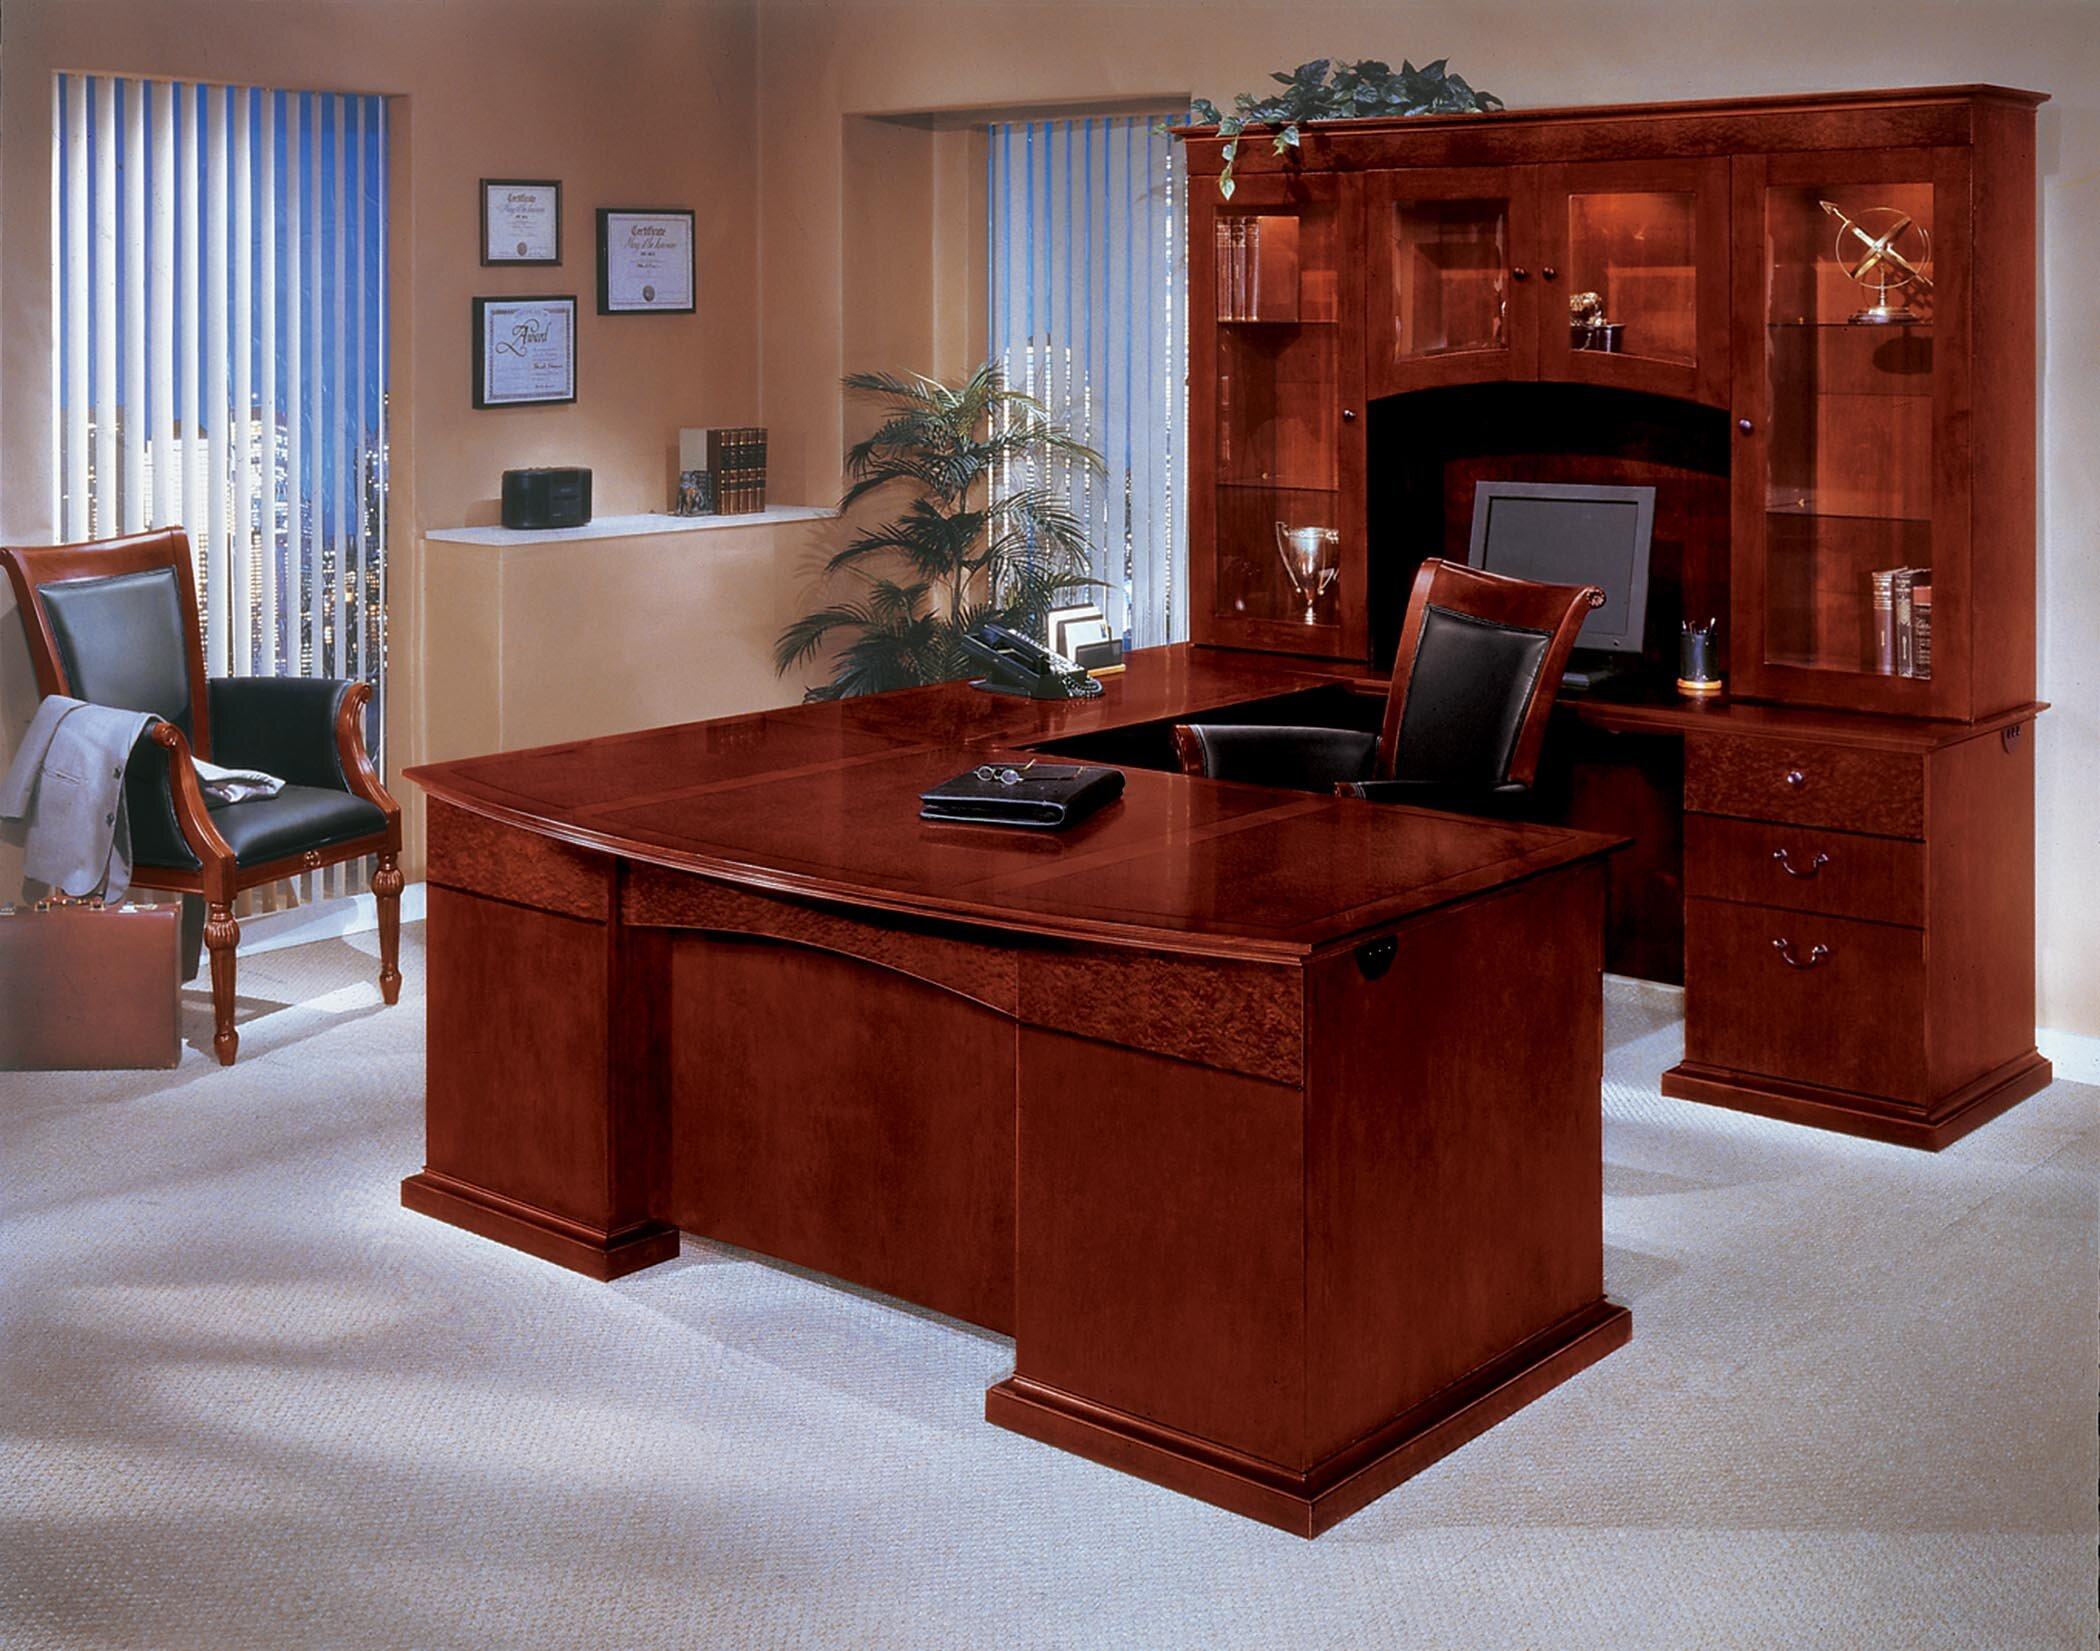 Charmant DMI Office Furniture Del Mar U Shape Executive Desk With Hutch | Wayfair